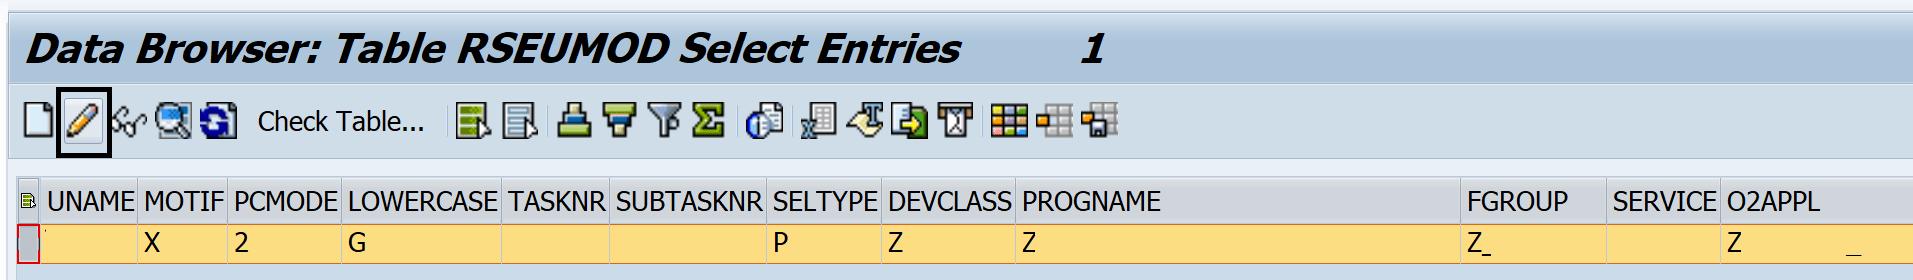 SAP se80 window resize bug where left navigation is hidden